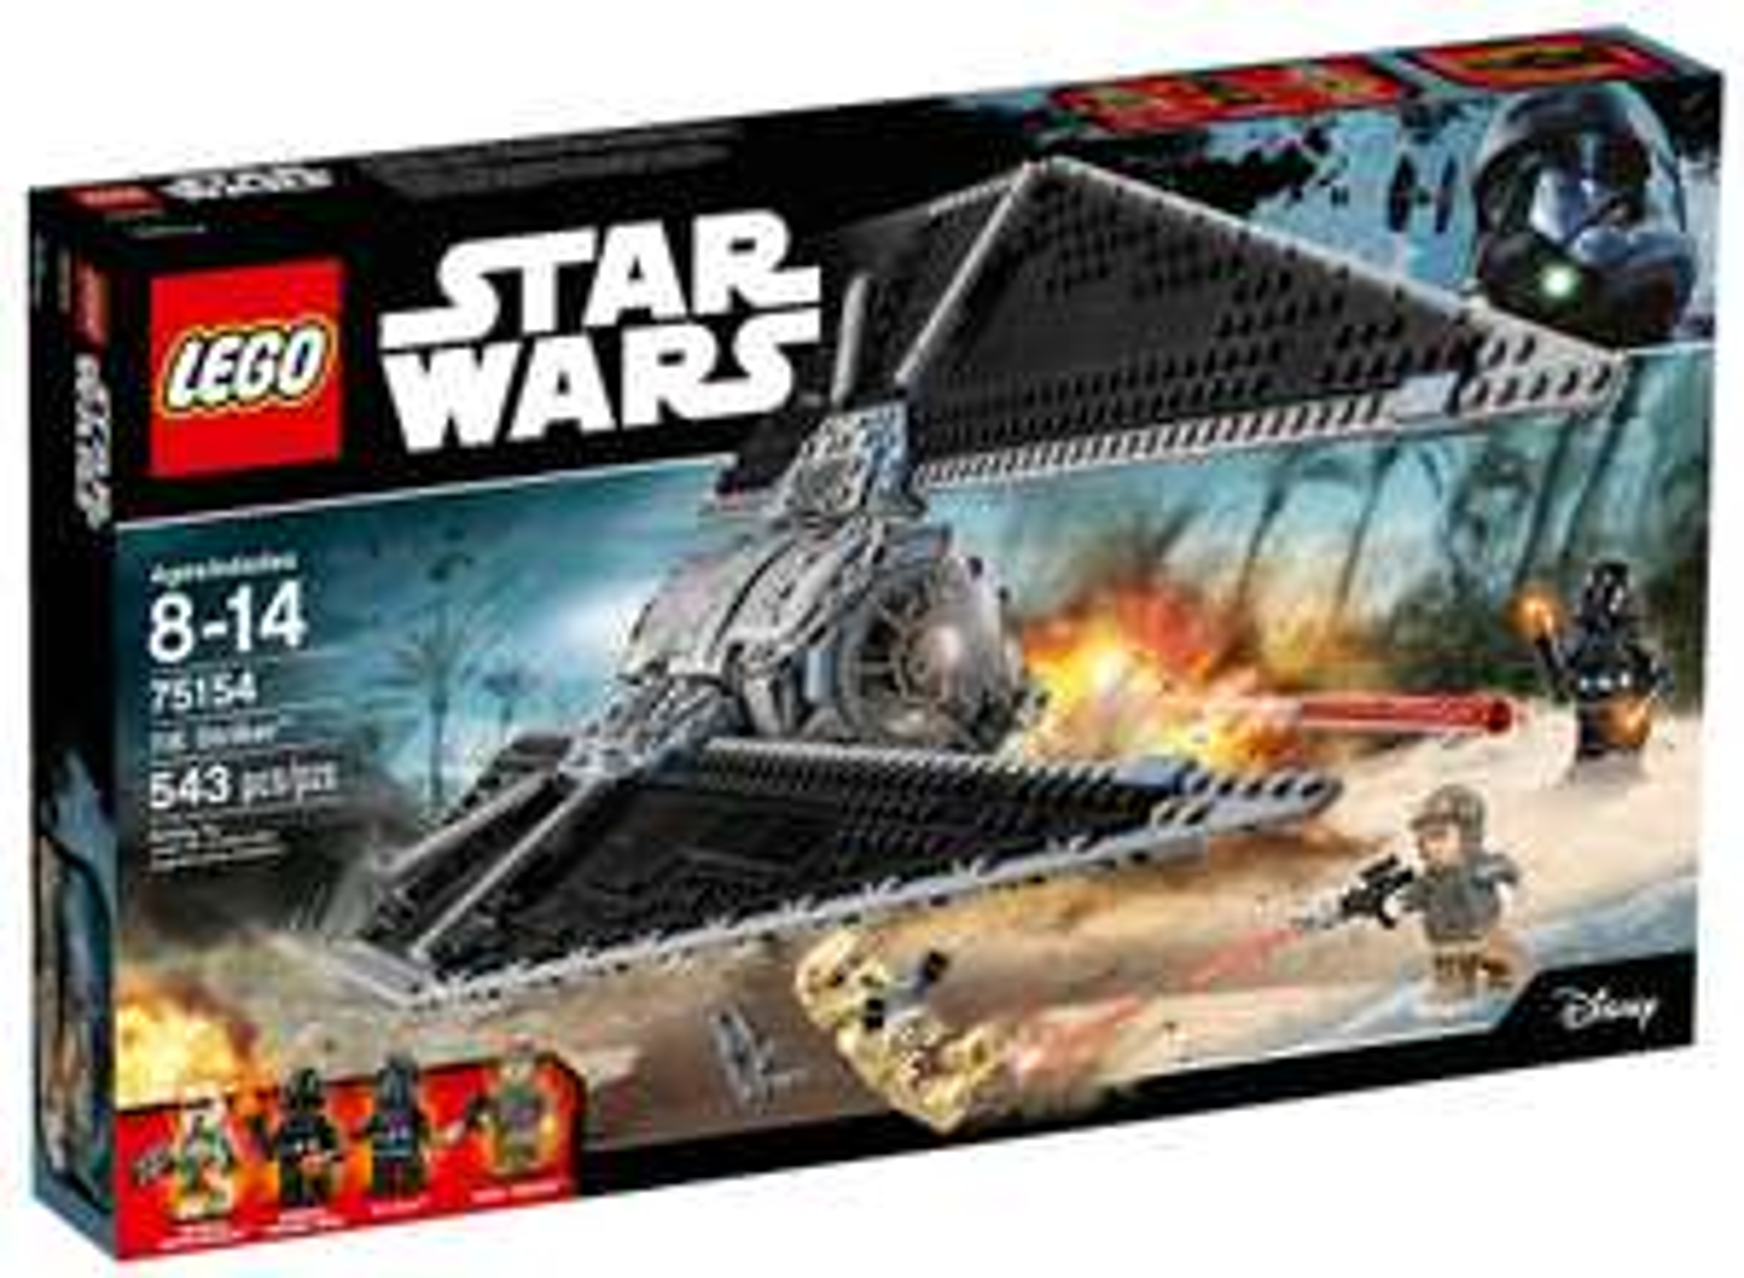 LEGO Star Wars 75154 TIE Striker £42 @ Debenhams